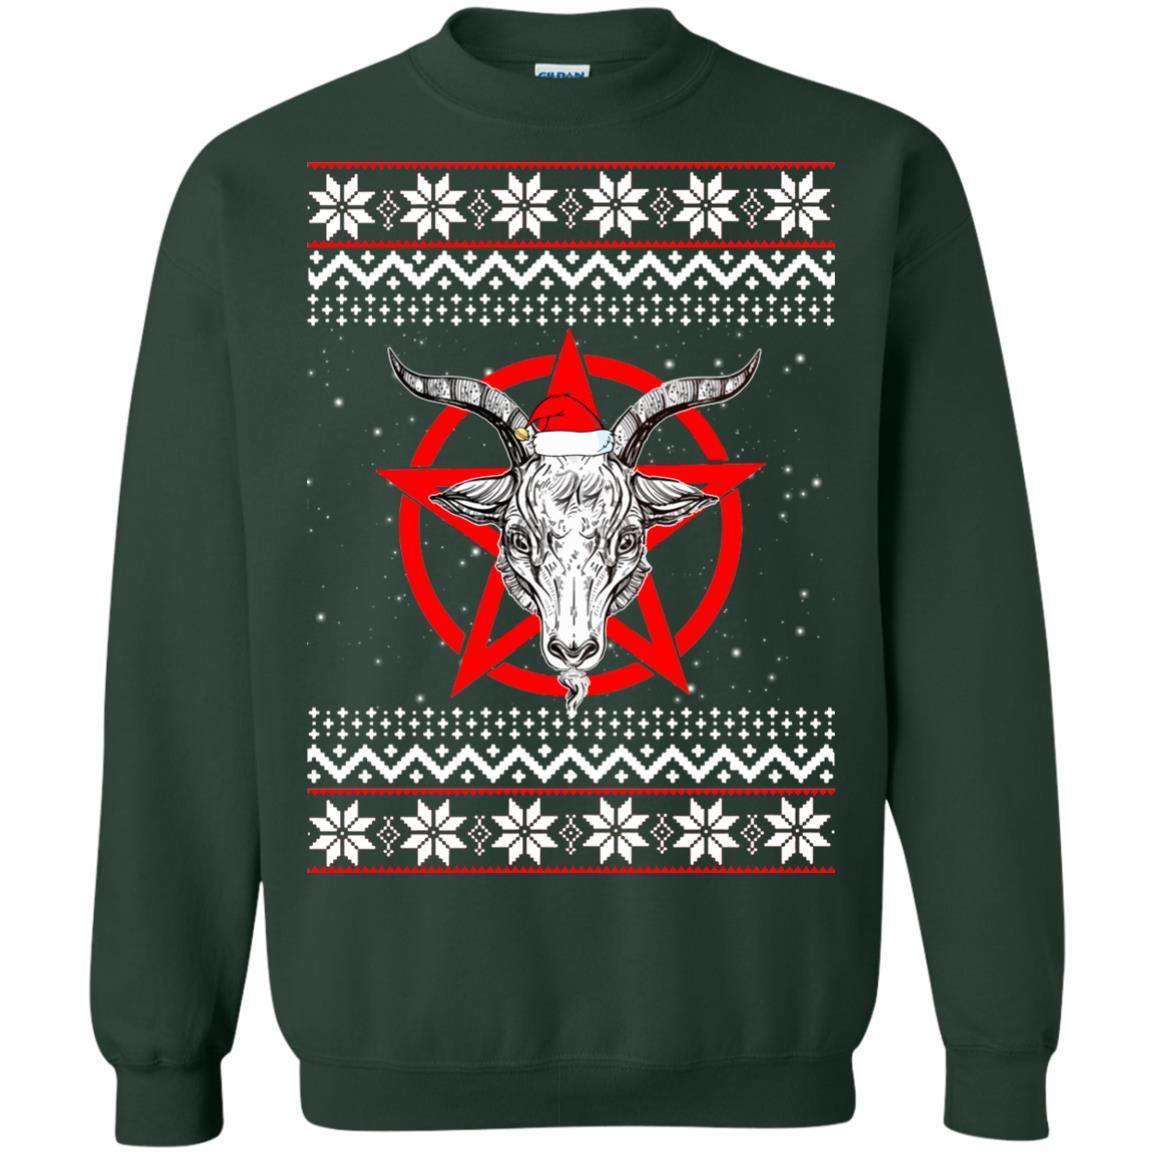 Satanic Christmas Sweater.Satanic Pentagram Christmas Sweater Hoodie Long Sleeve